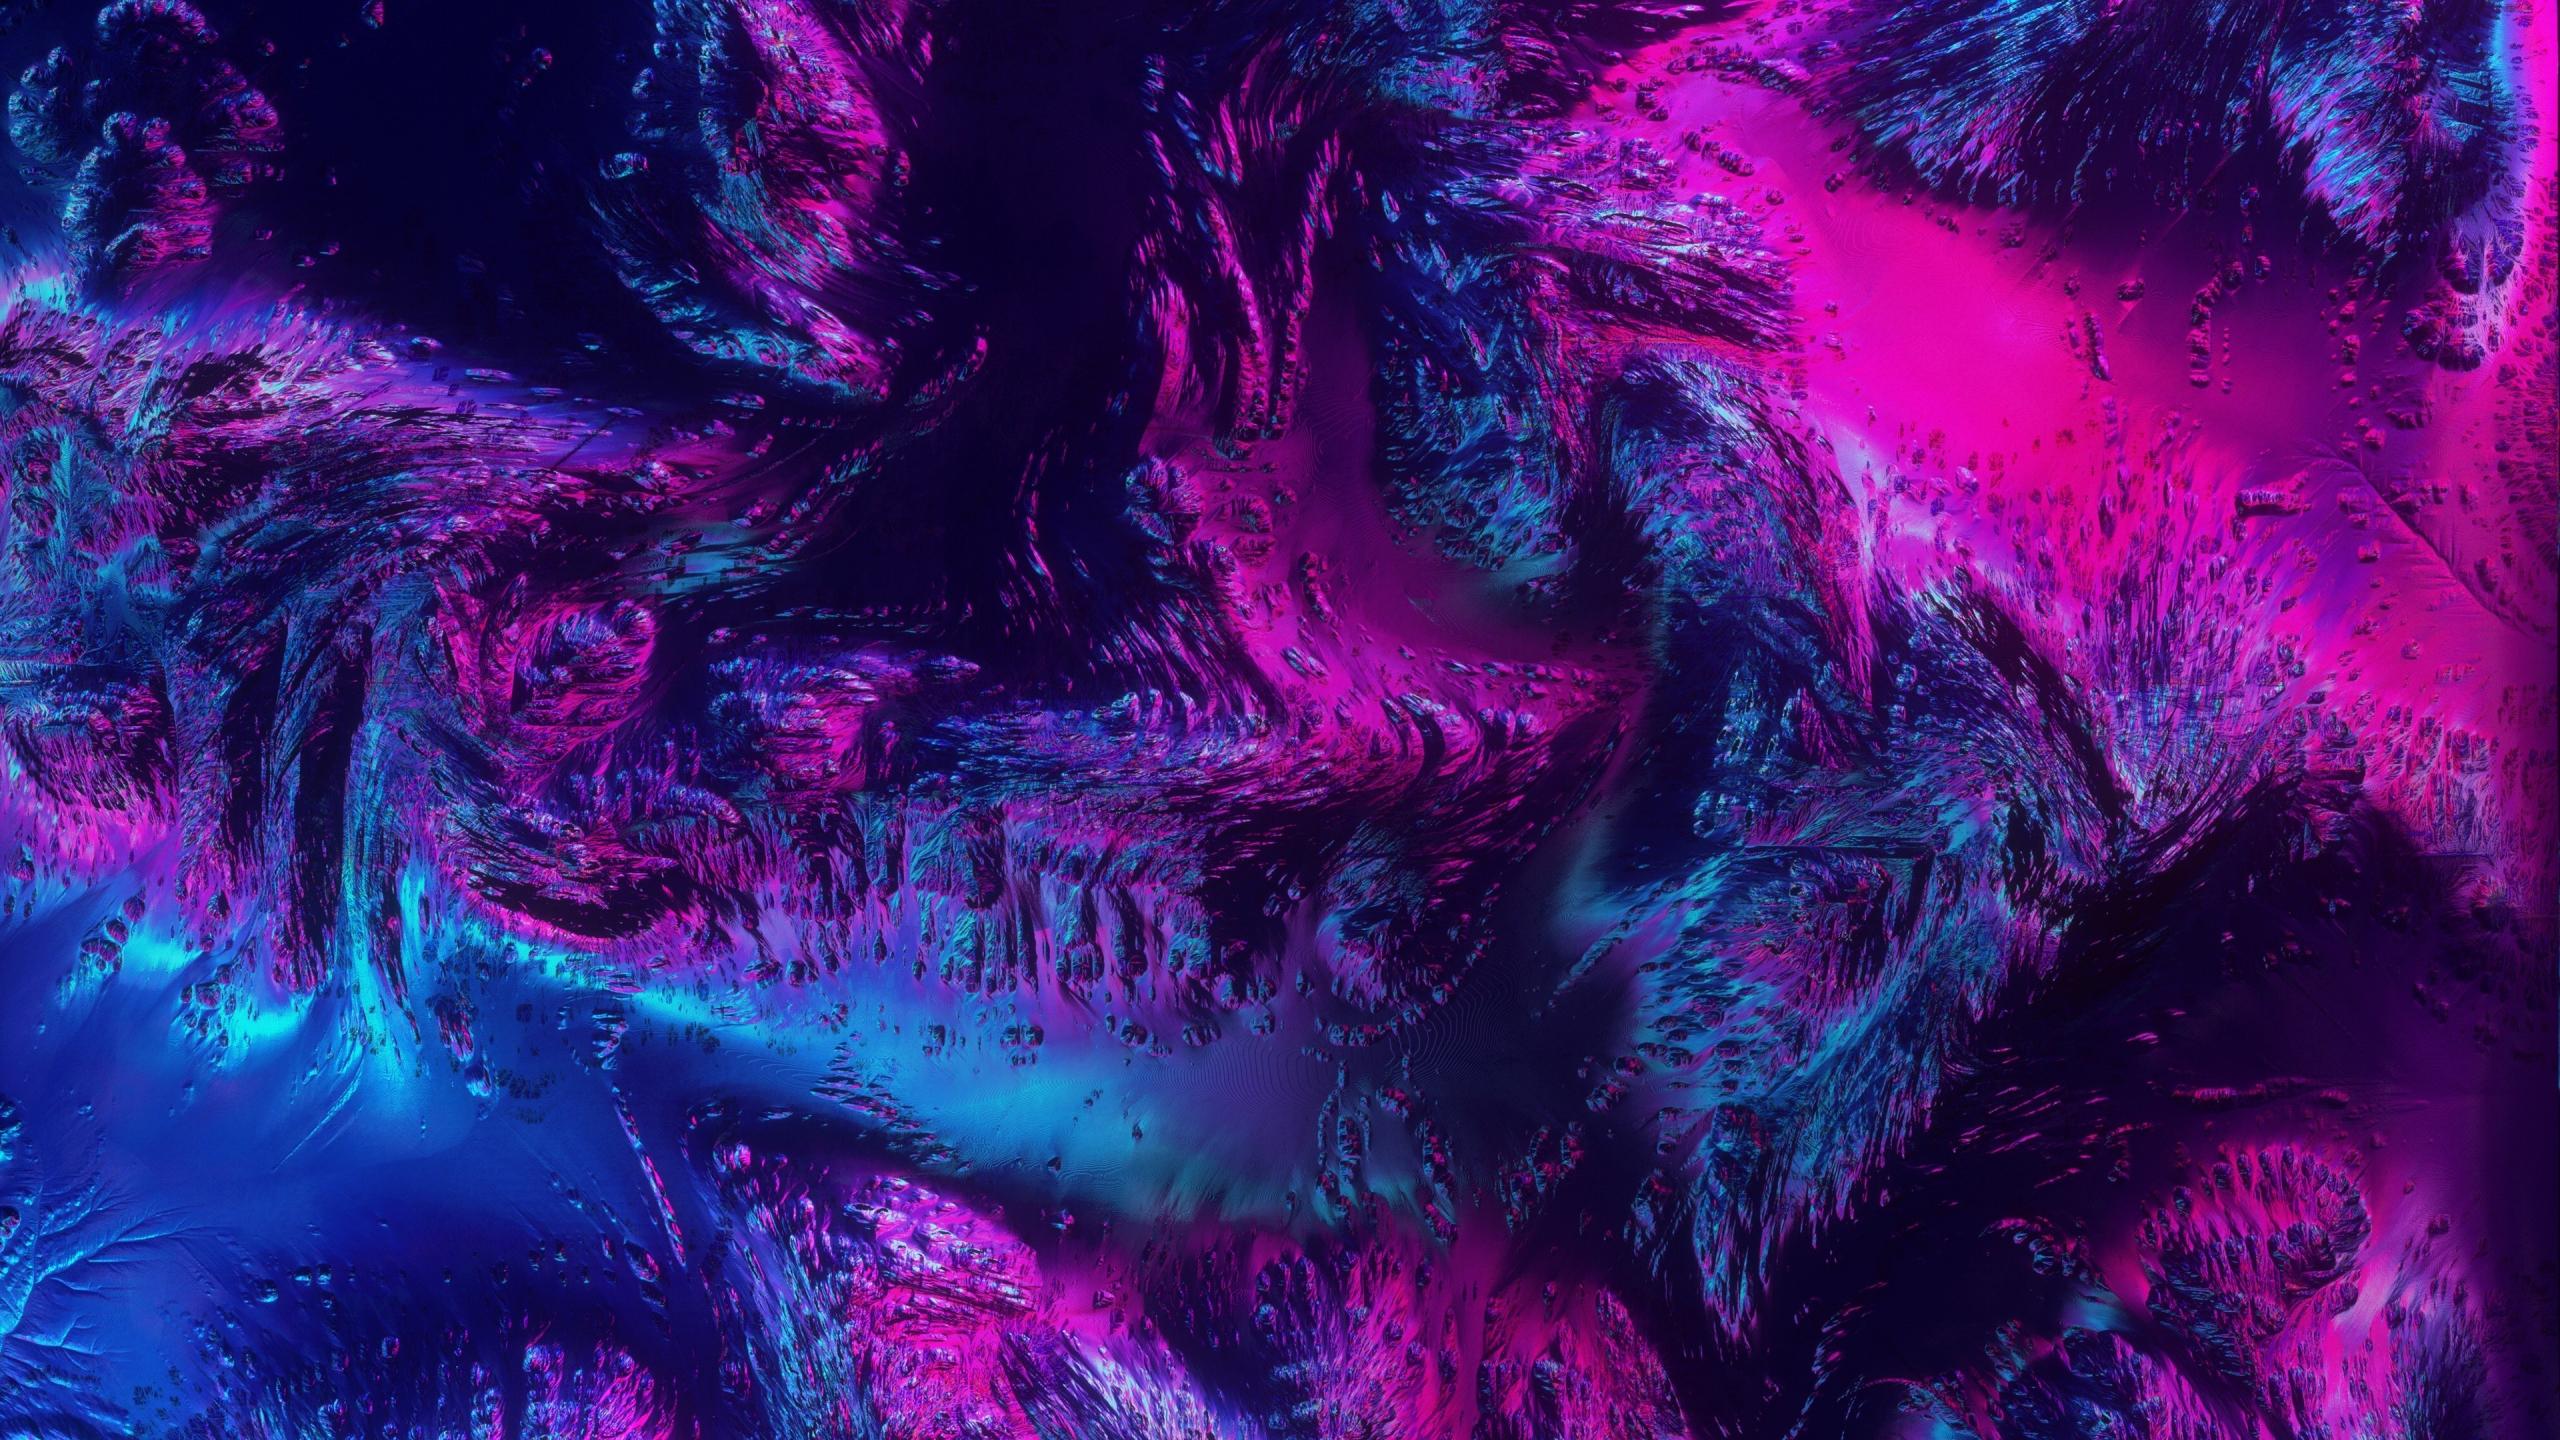 Download 2560x1440 Wallpaper Neon Texture Abstract Dark Art Dual Wide Widescreen 16 9 Widescreen 2560x1440 Hd Image Background 16366